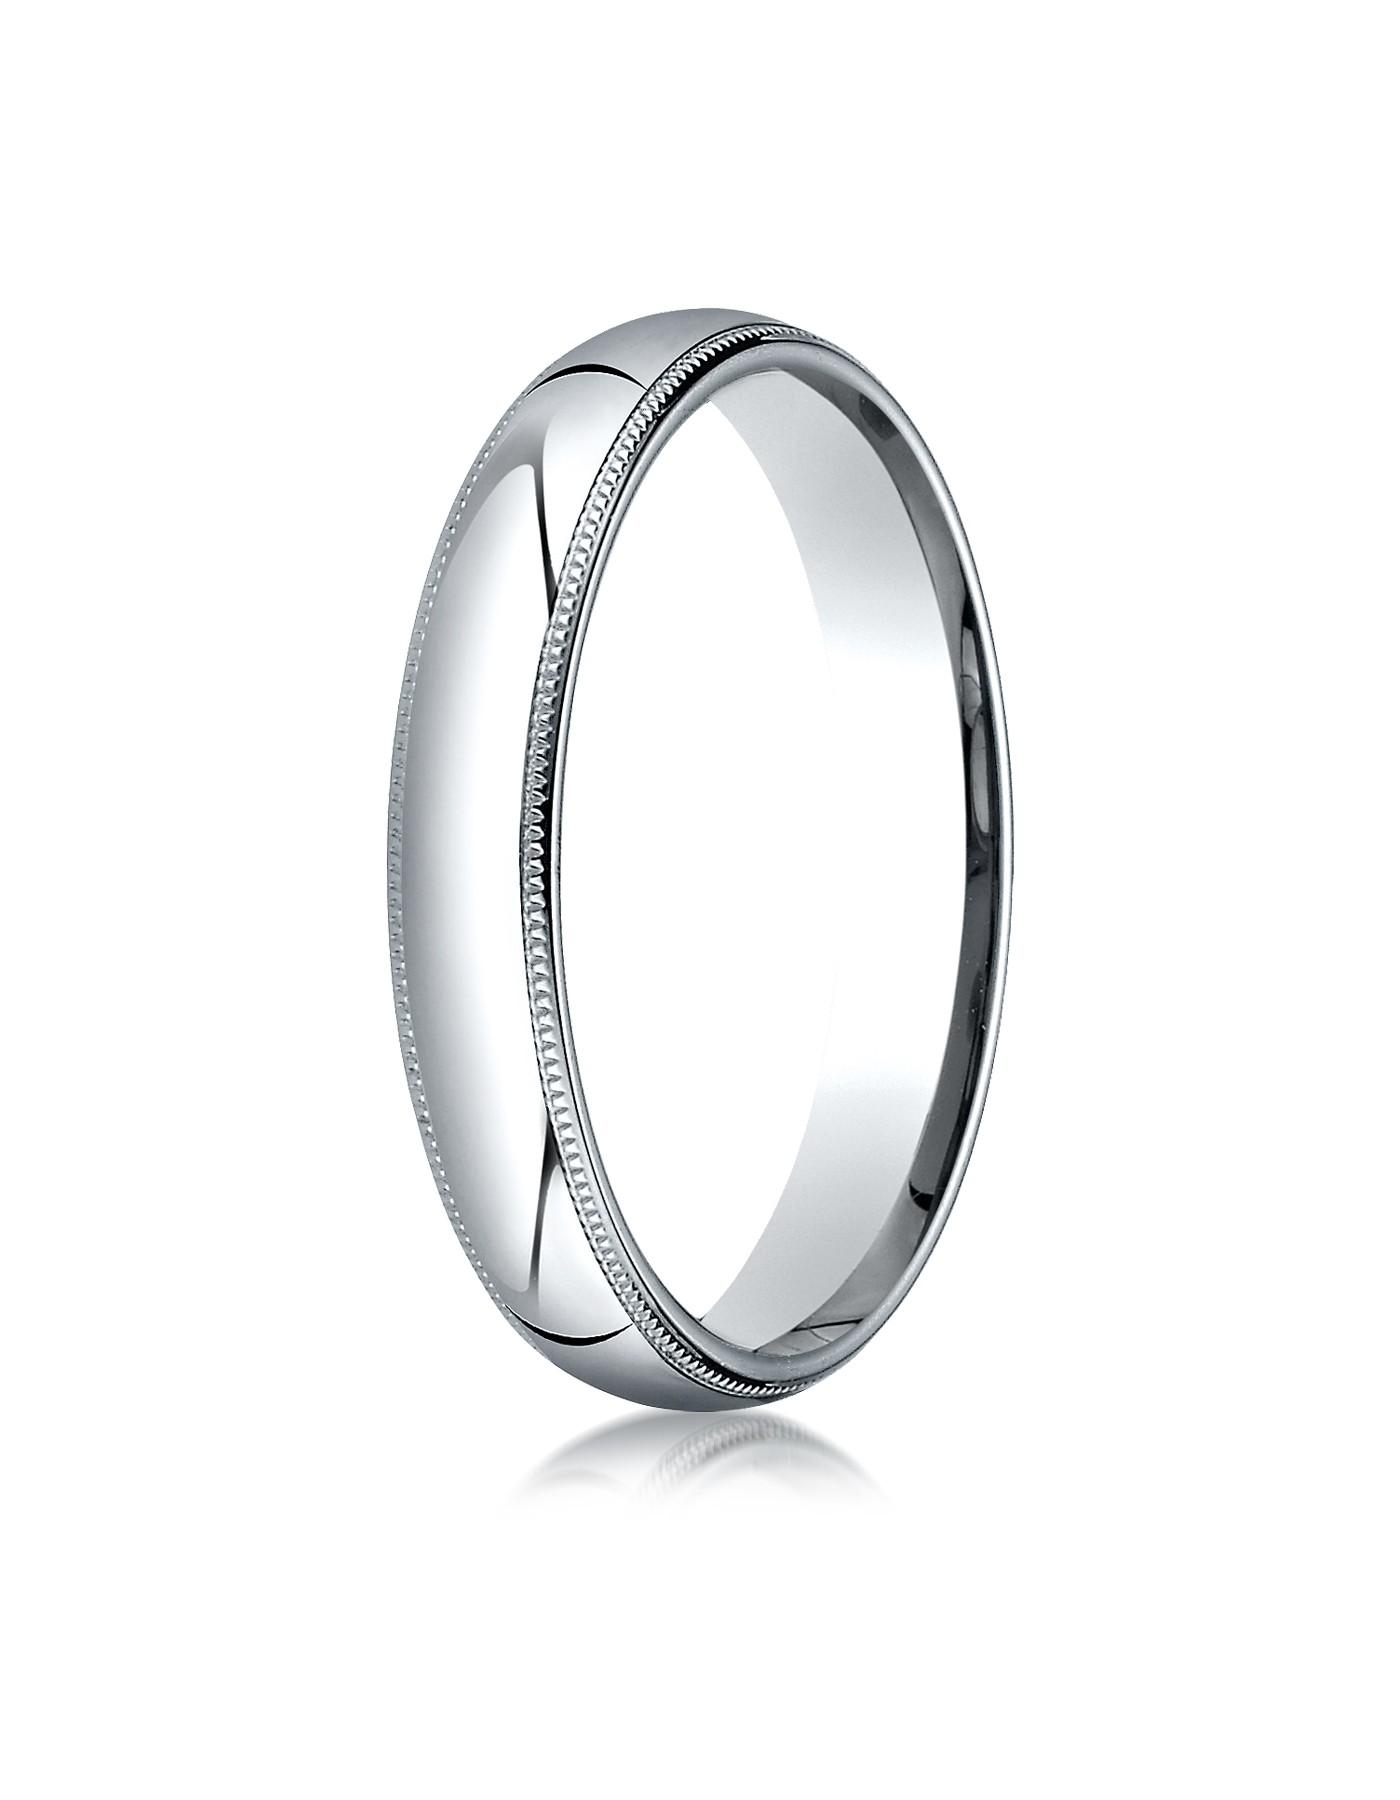 14k White Gold 4mm Slightly Domed Standard Comfort-fit Ring With Milgrain